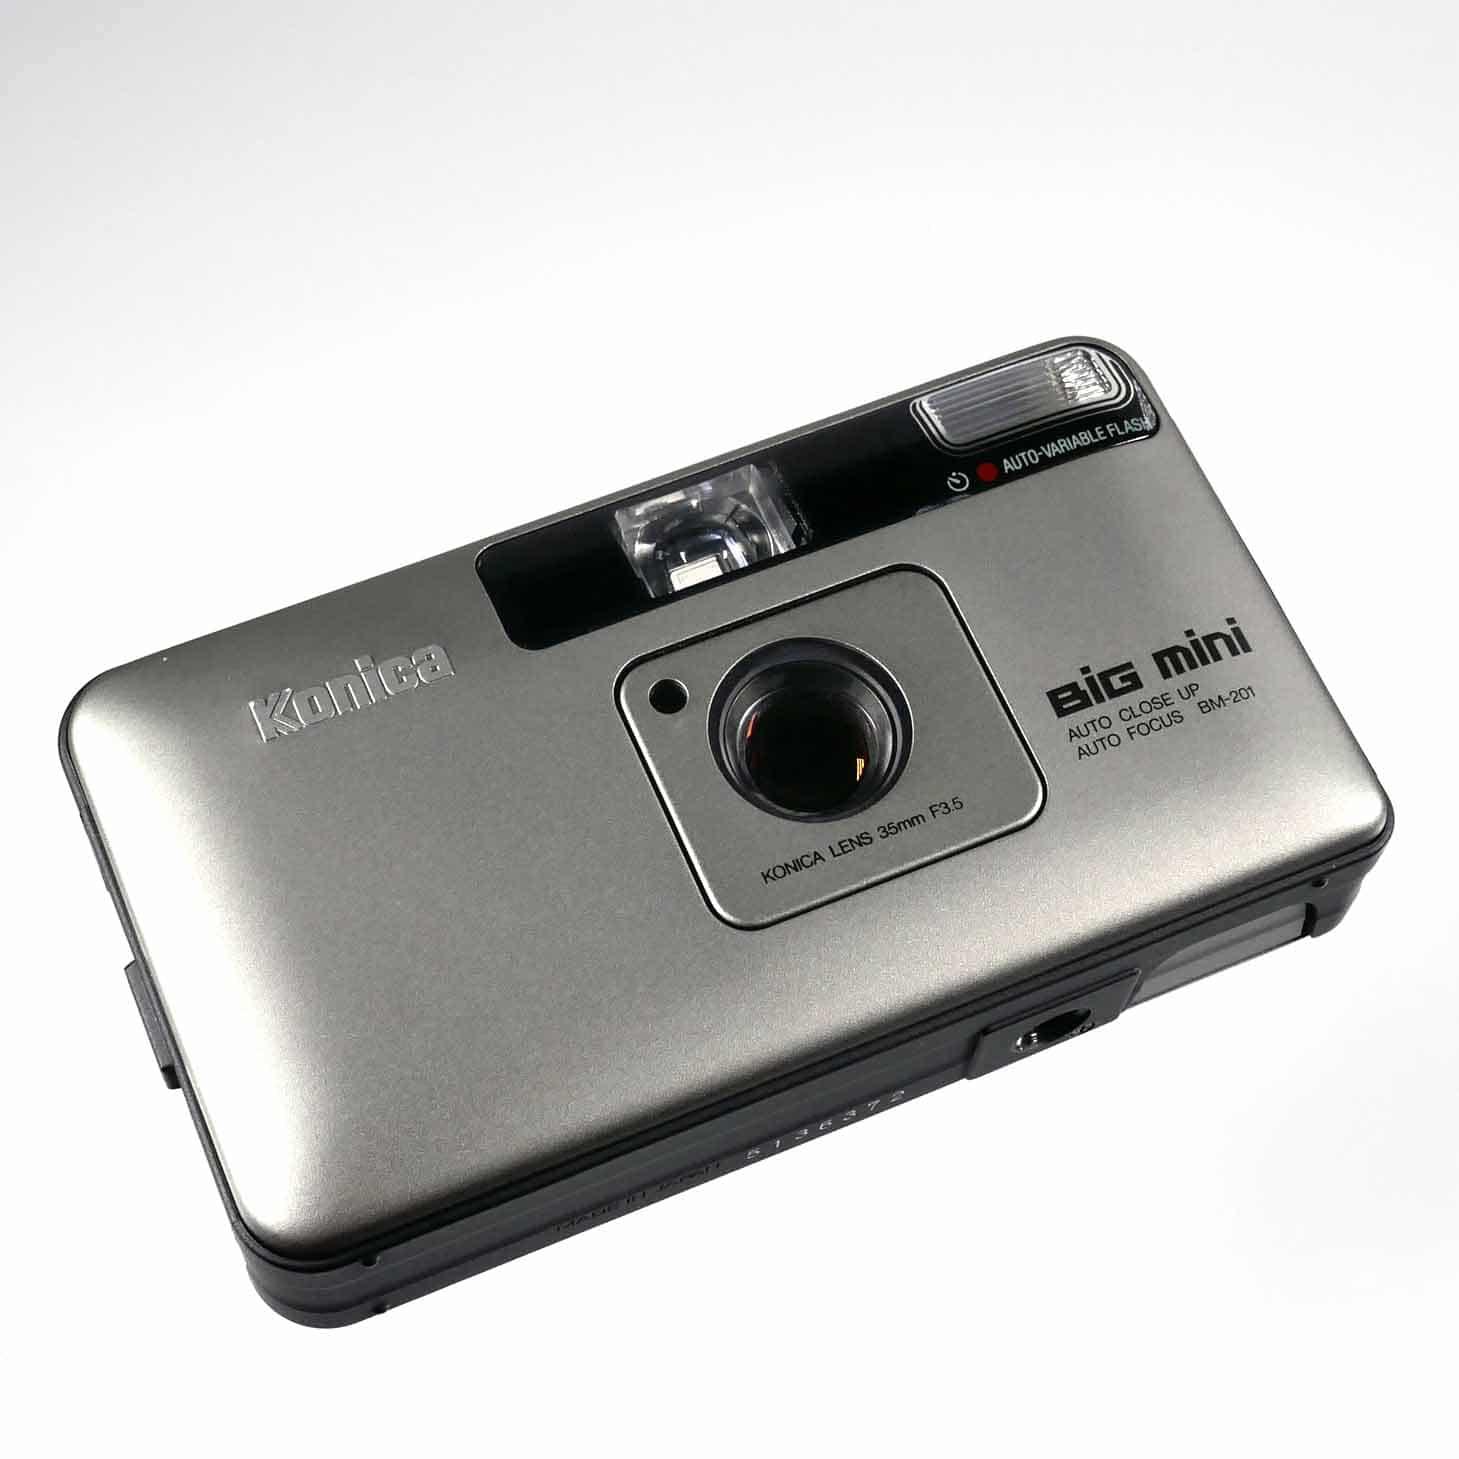 clean-cameras-Konica-Big.mini-05